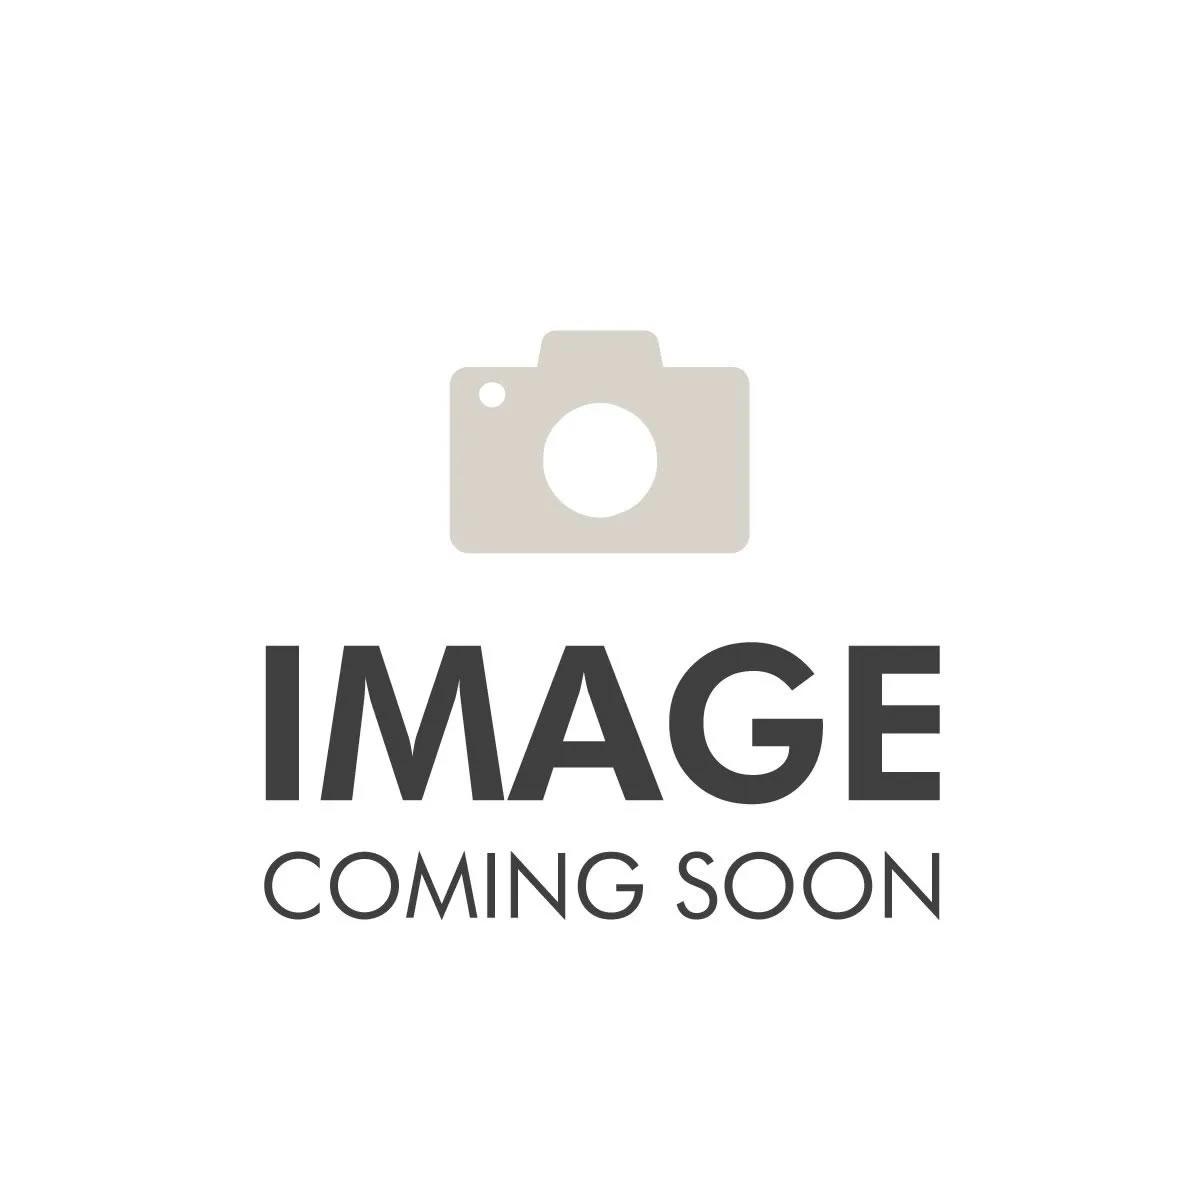 XHD Aluminum Front Bumper, Non-Winch Mount